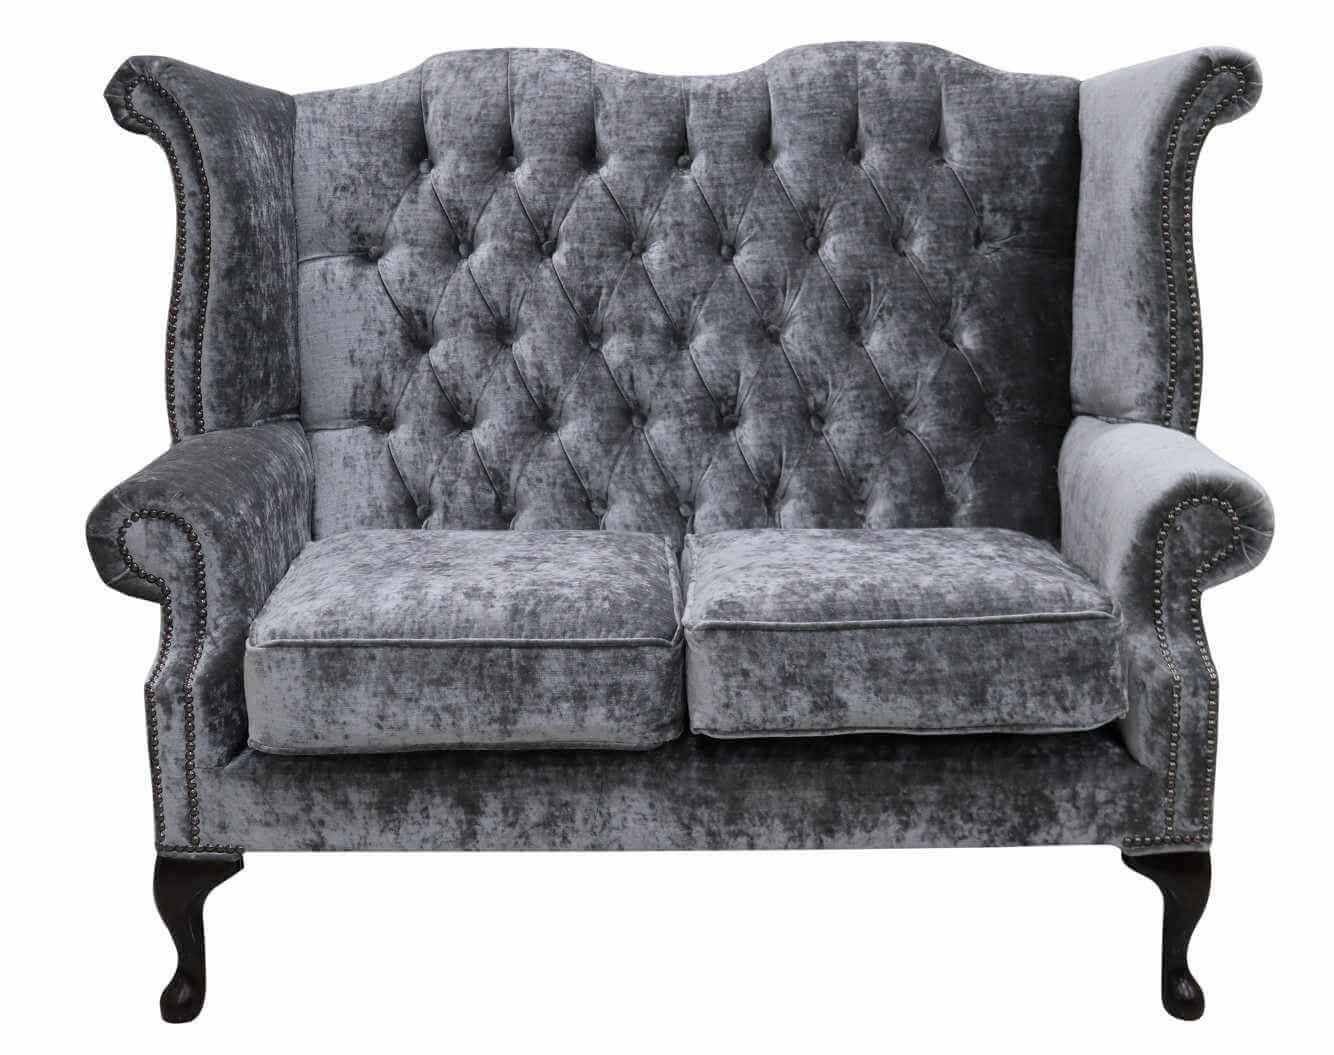 Swell Details About Chesterfield 2 Seater Queen Anne High Back Wing Sofa Modena Regency Grey Velvet Spiritservingveterans Wood Chair Design Ideas Spiritservingveteransorg